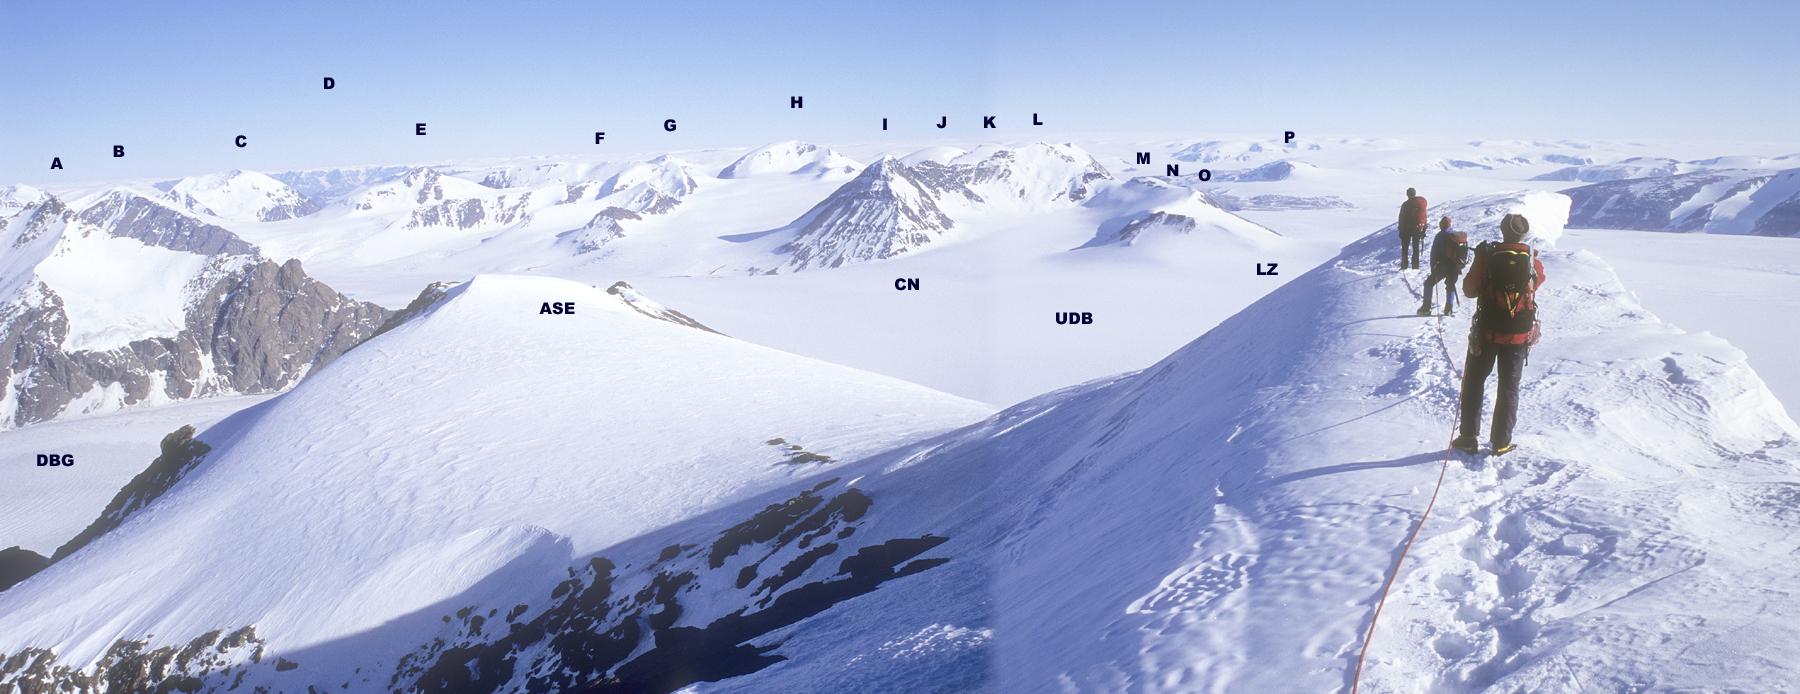 Central peaks of Paul Stern Land seen during the traverse of Ararat. (A) Arken. (B) Pk. 2,260m. (C) Pk. 2,320m. (D) Distant mountains of Gaaseland. (E) Pk. 2,324m. (F) Pk. 2,240m. (G) Sfinks. (H) Snehorn (2,240m). (I) Baendalbjerg with Cloudspotter's Ridge falling toward (CN), Camp Noah. (J) Pk. 2,370m. (K) Pk. 2,377m. (L) Pk. ca 2,350m. (M) Pk. Bruno. (N) Copper Knob. (O) Weisskopf. (P) Vindbjorne (1,830m). (DBG) North branch of Doede Brae Glacier. (ASE) Southeast ridge of Ararat, descended during traverse. (UDB) Upper Doede Brae. (LZ) Landing Zone at 1,540m. Following a straight line in front of the climbers it is ca 150km to the Watkins Mountains and Gunnbjornsfjeld.